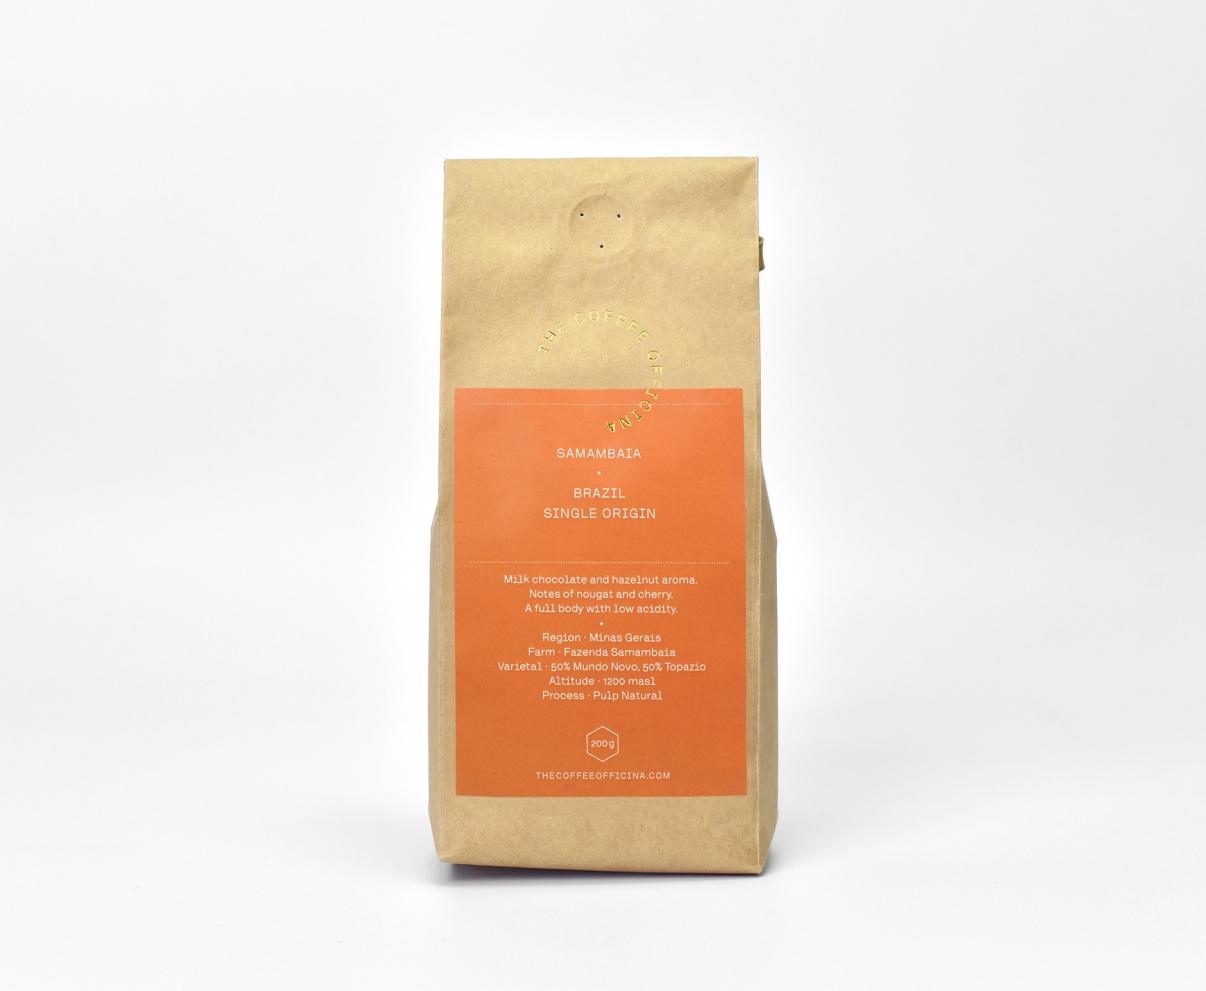 The Coffee Officina Samambaia Brazil Single Origin